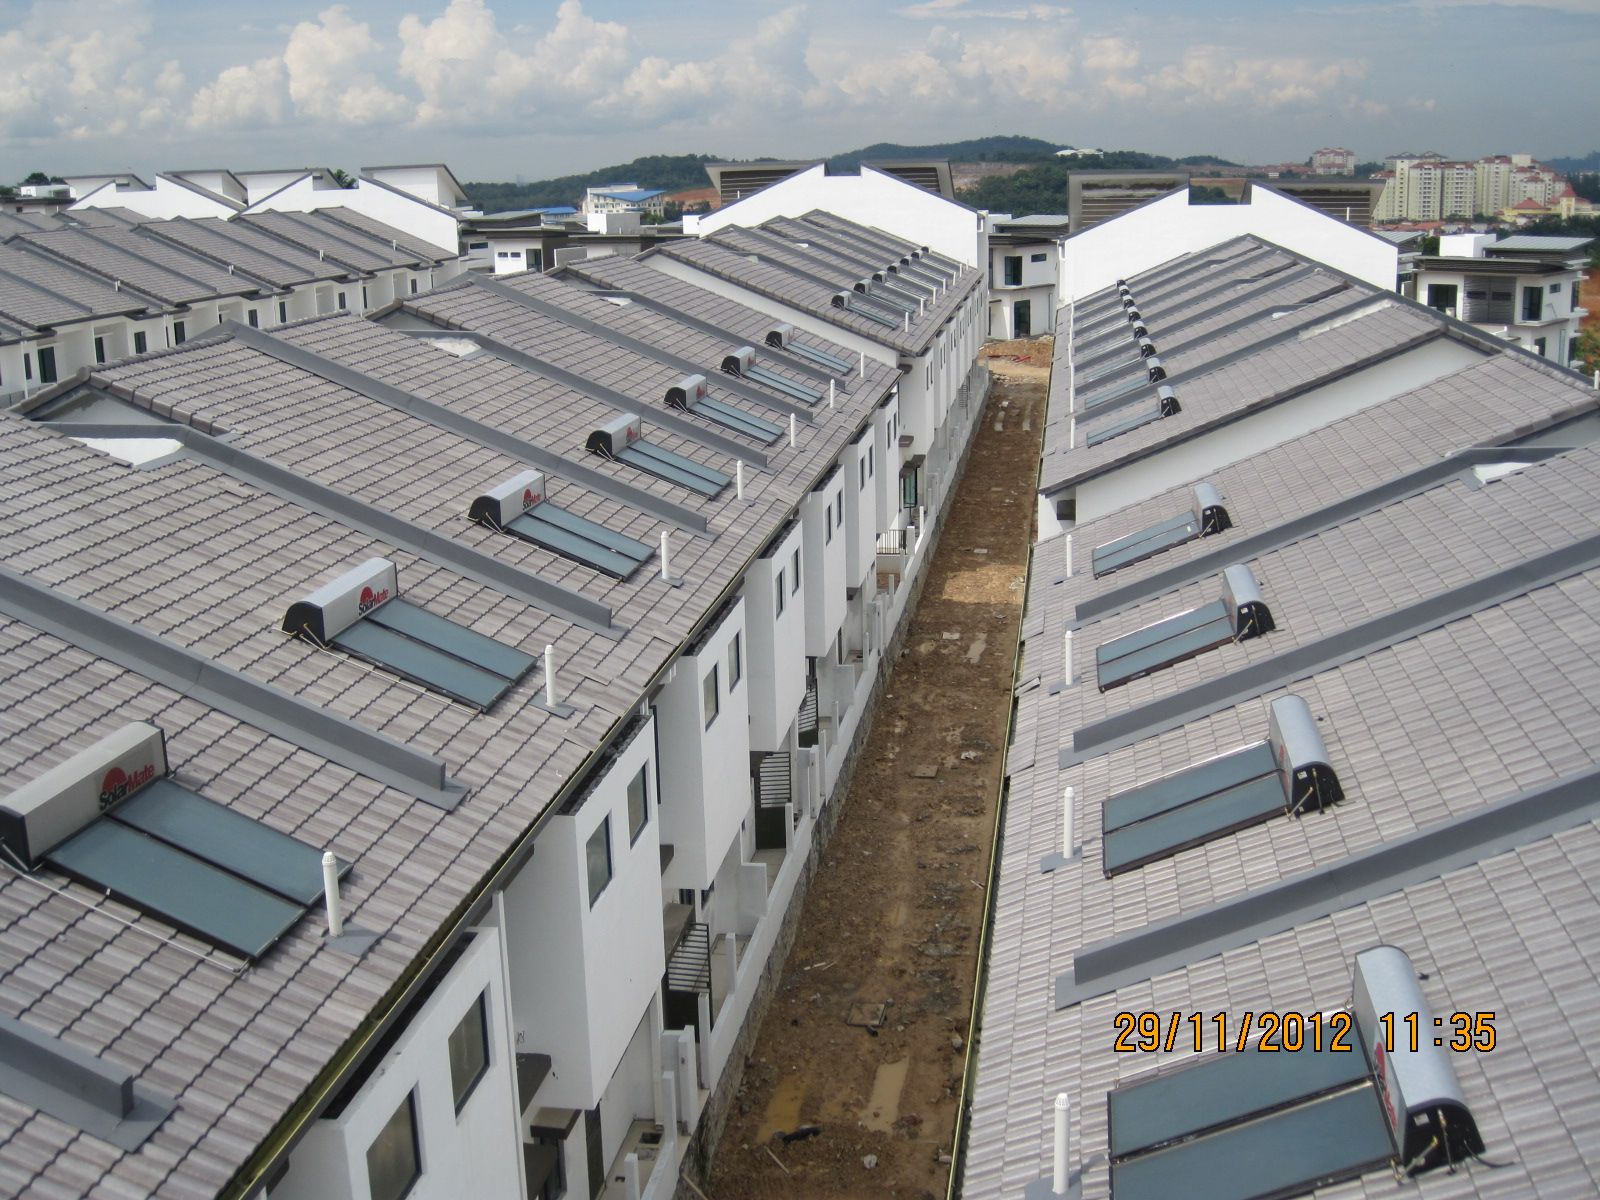 Solarmate Malaysia Solar Water Heaters Solar Hot Water Heating Systems Solar Panels Solar Pv Solar Flat Water Heating Systems Solar Hot Water Water Heating